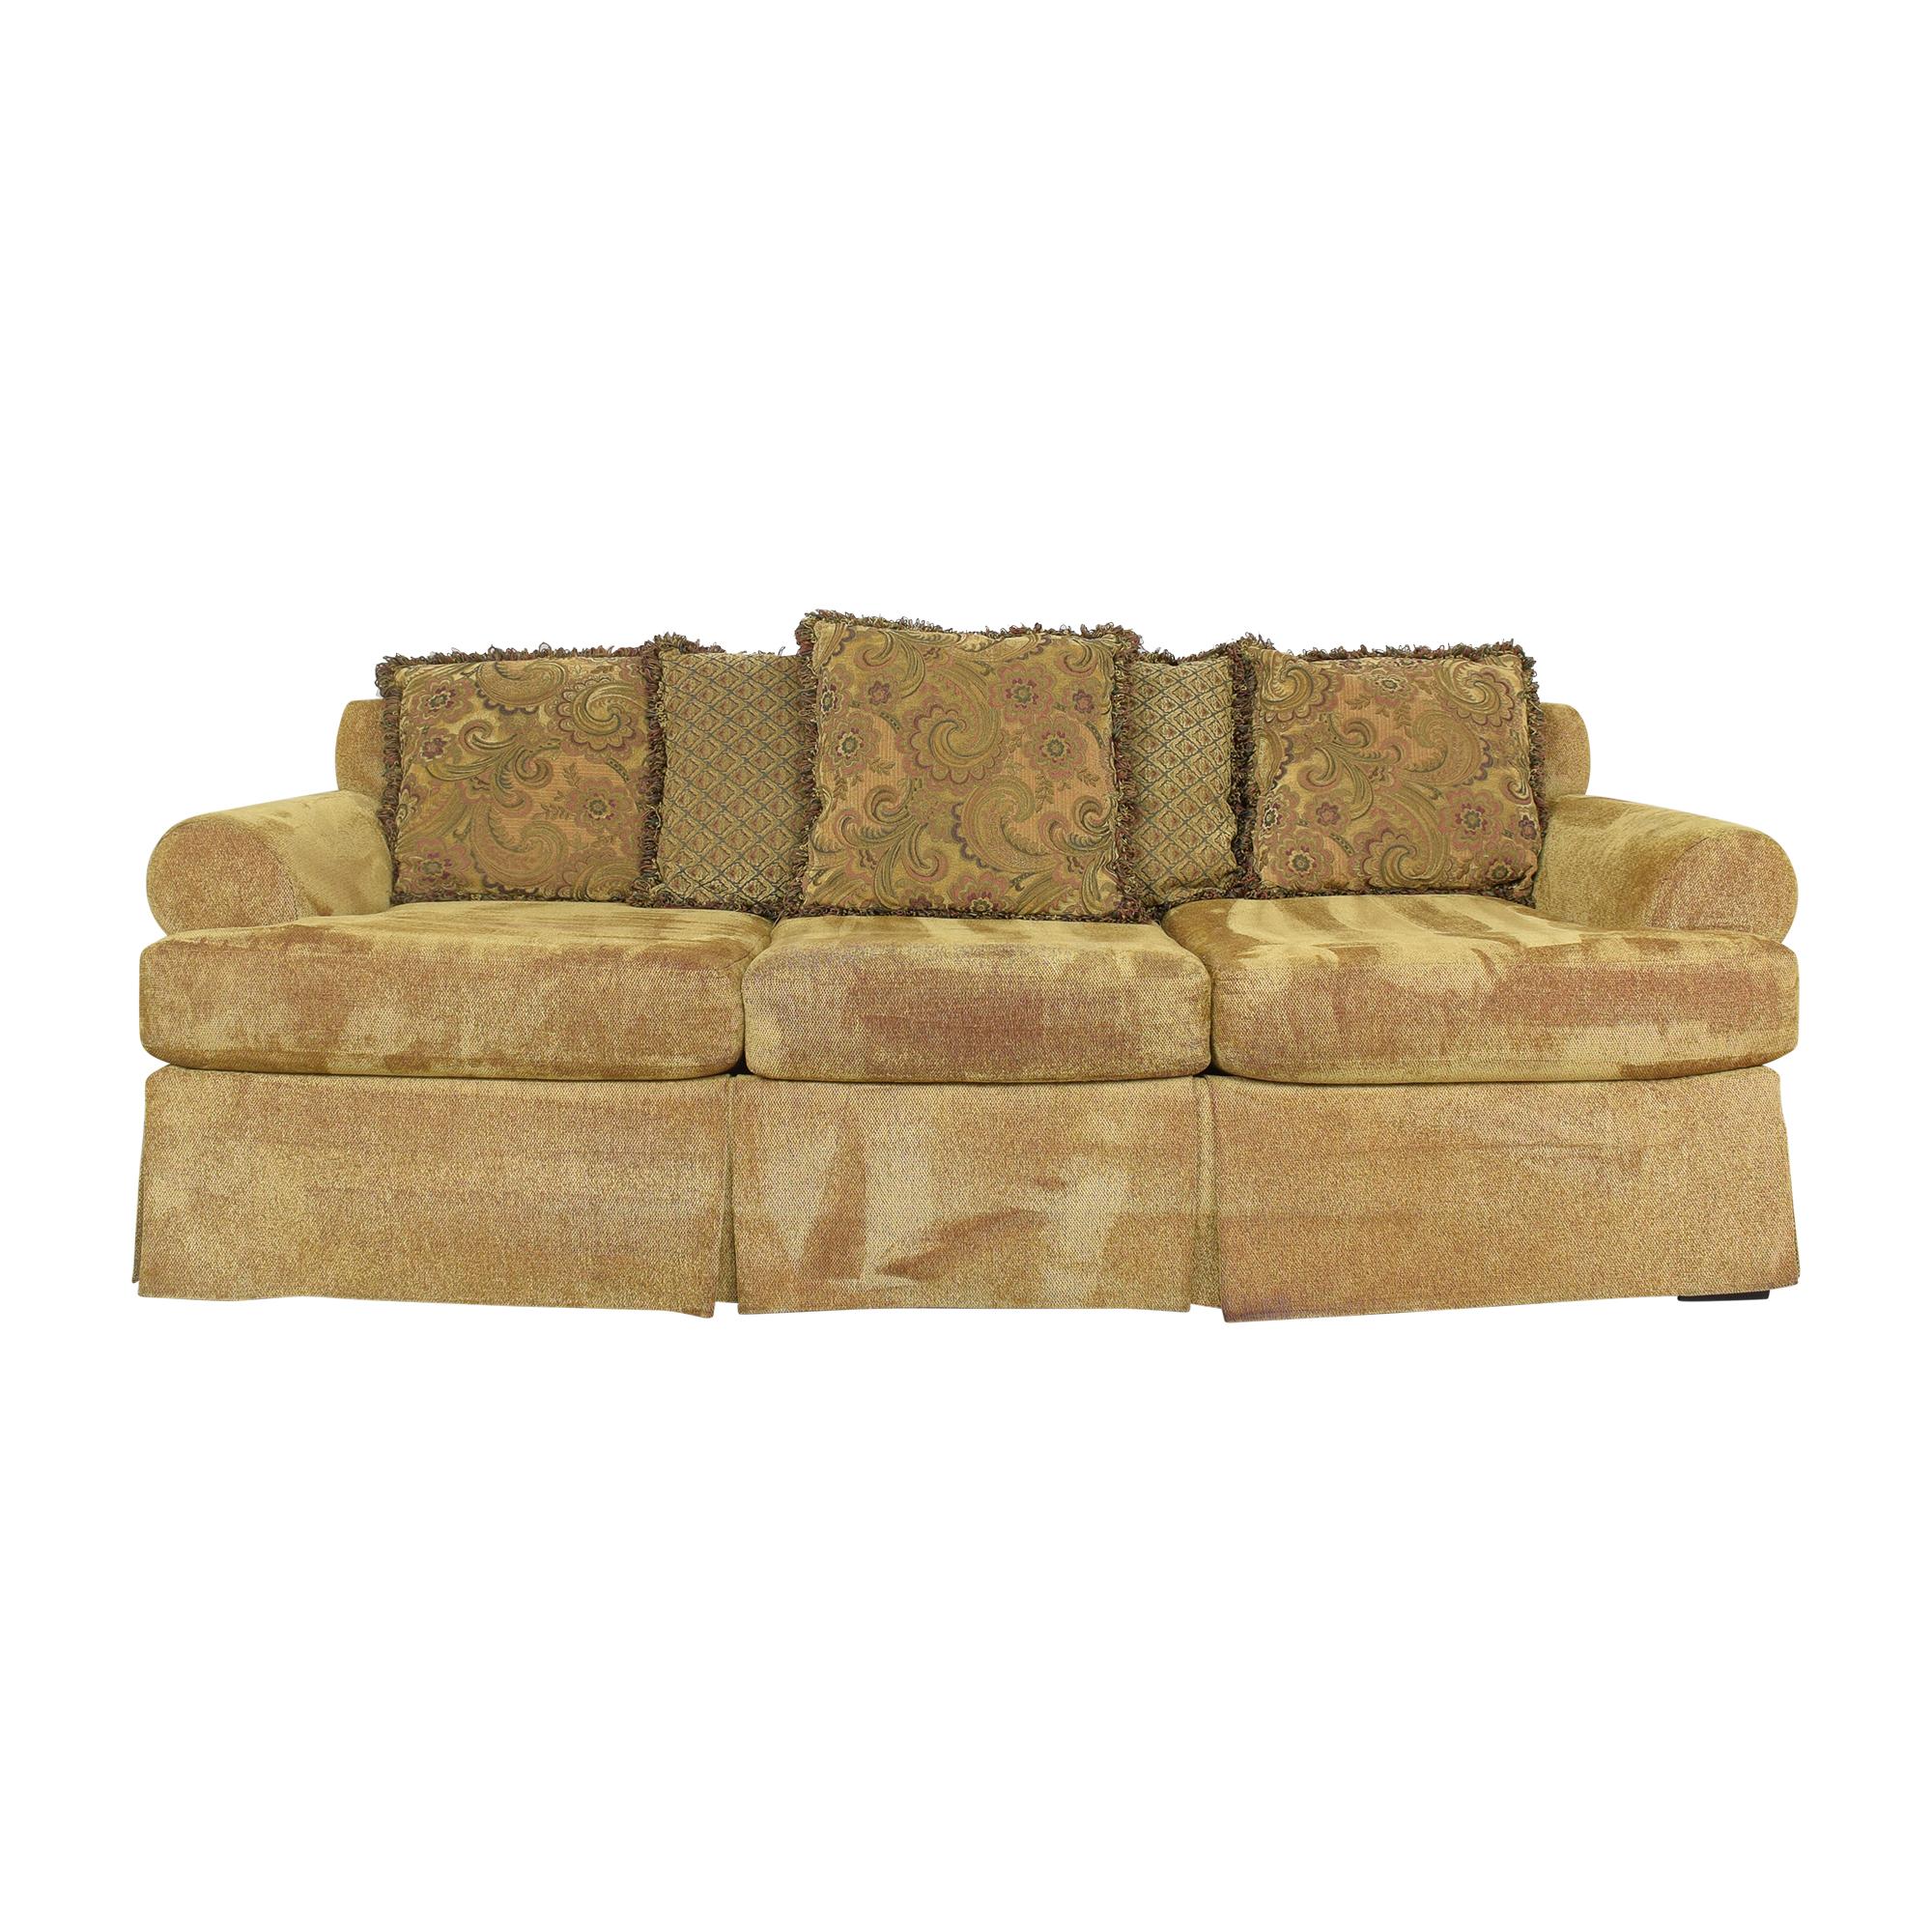 shop Emeraldcraft Emeraldcraft Three Cushion Skirted Sofa online